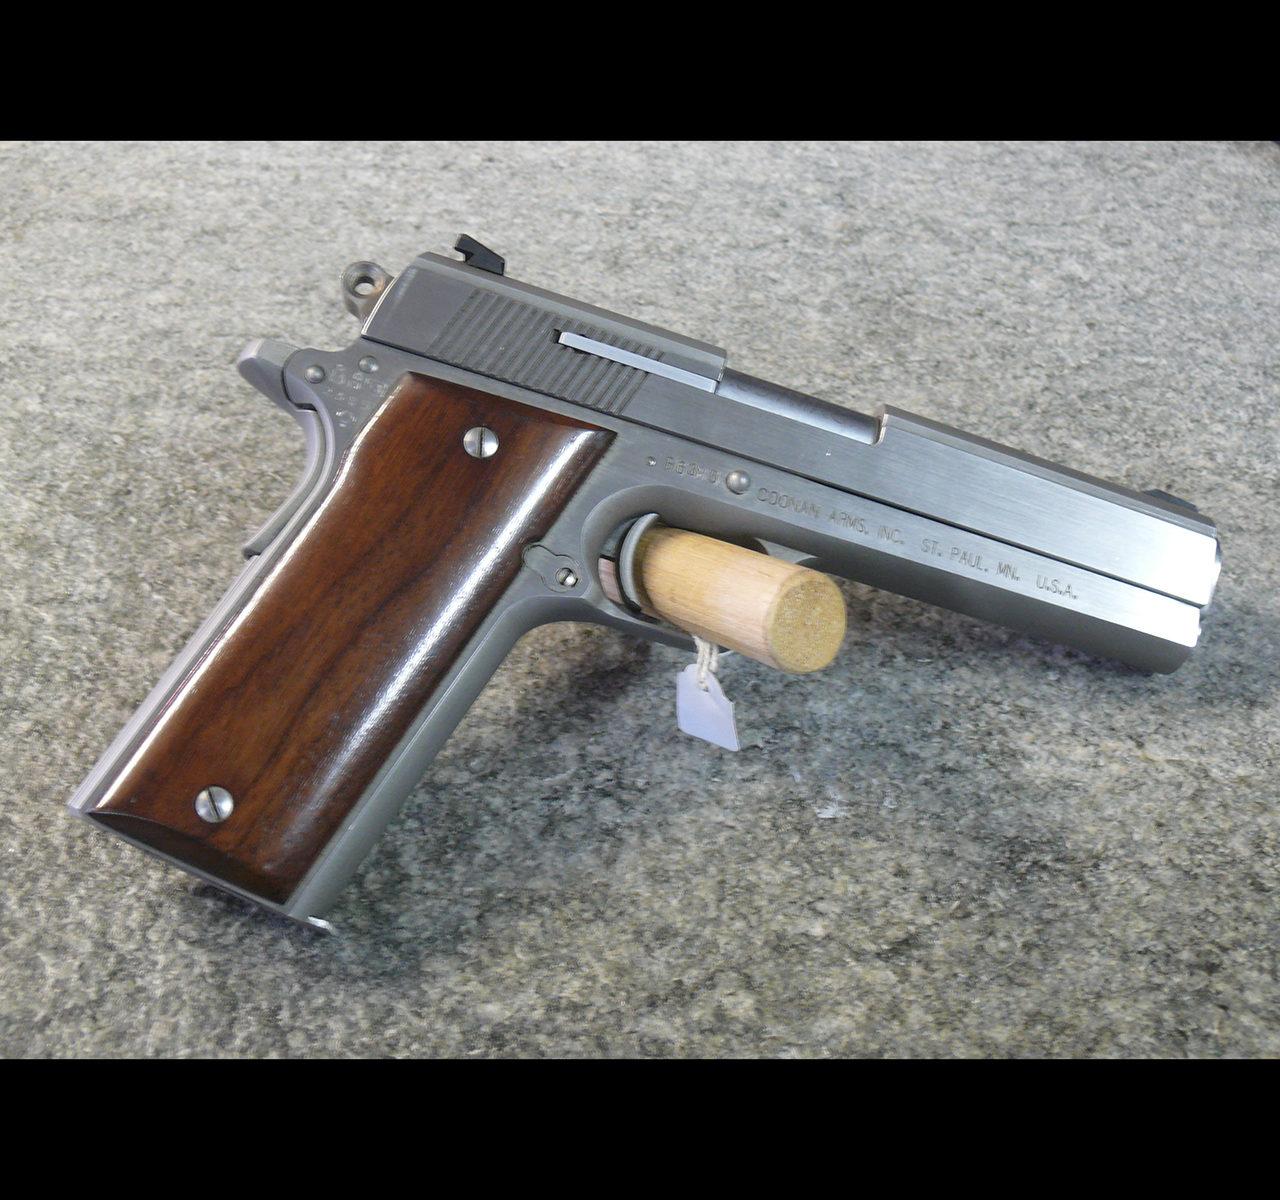 pistola coonan © armeriatower